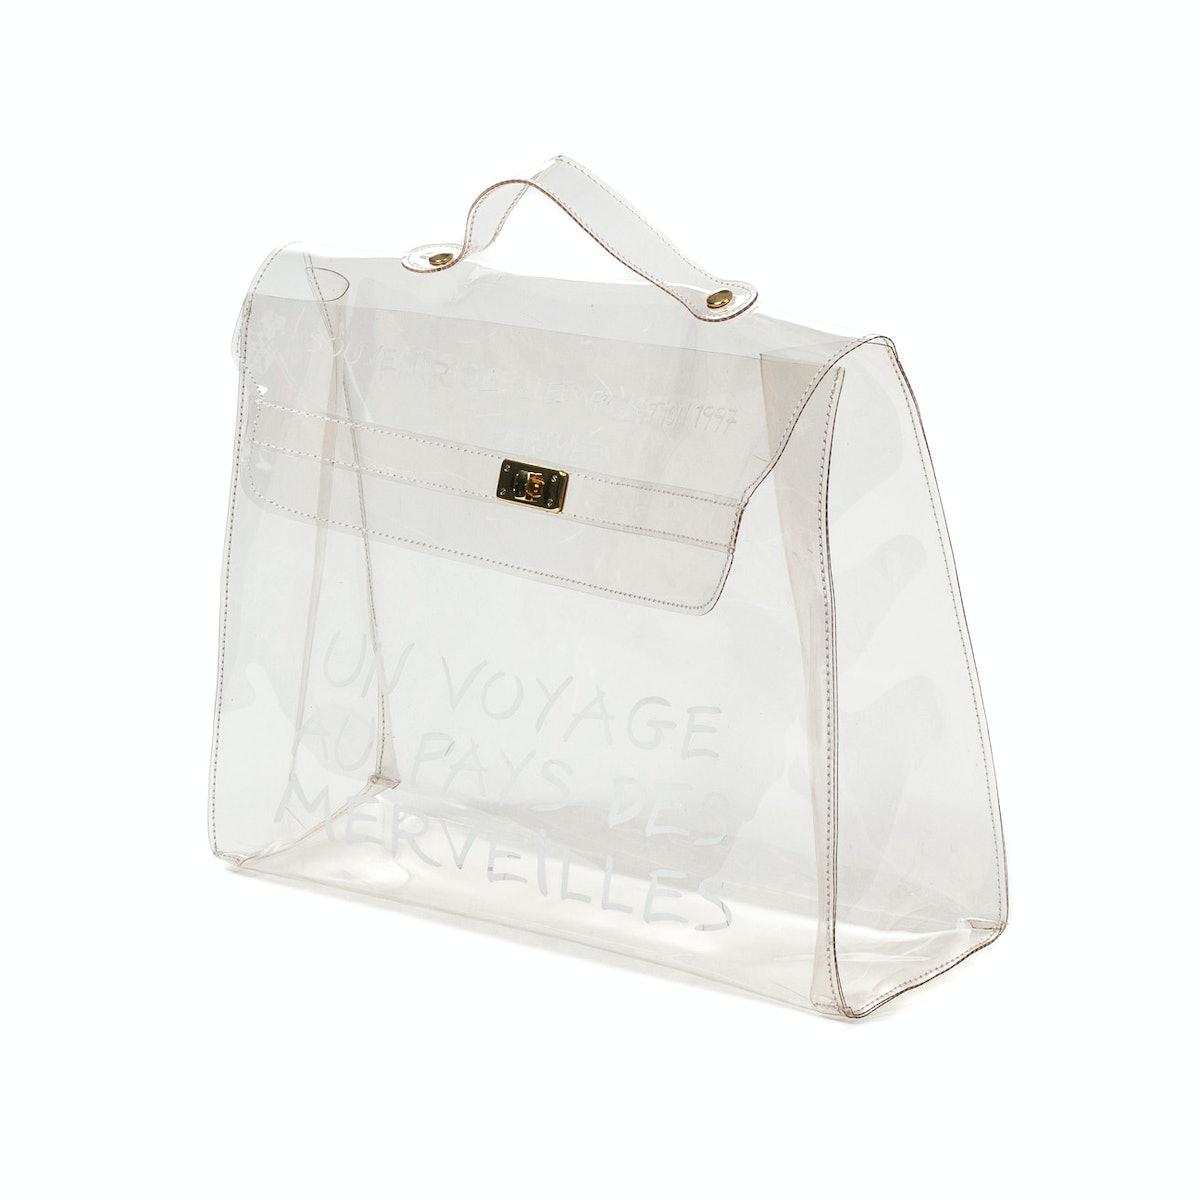 Hermes Kelly bag in transparent vinyl